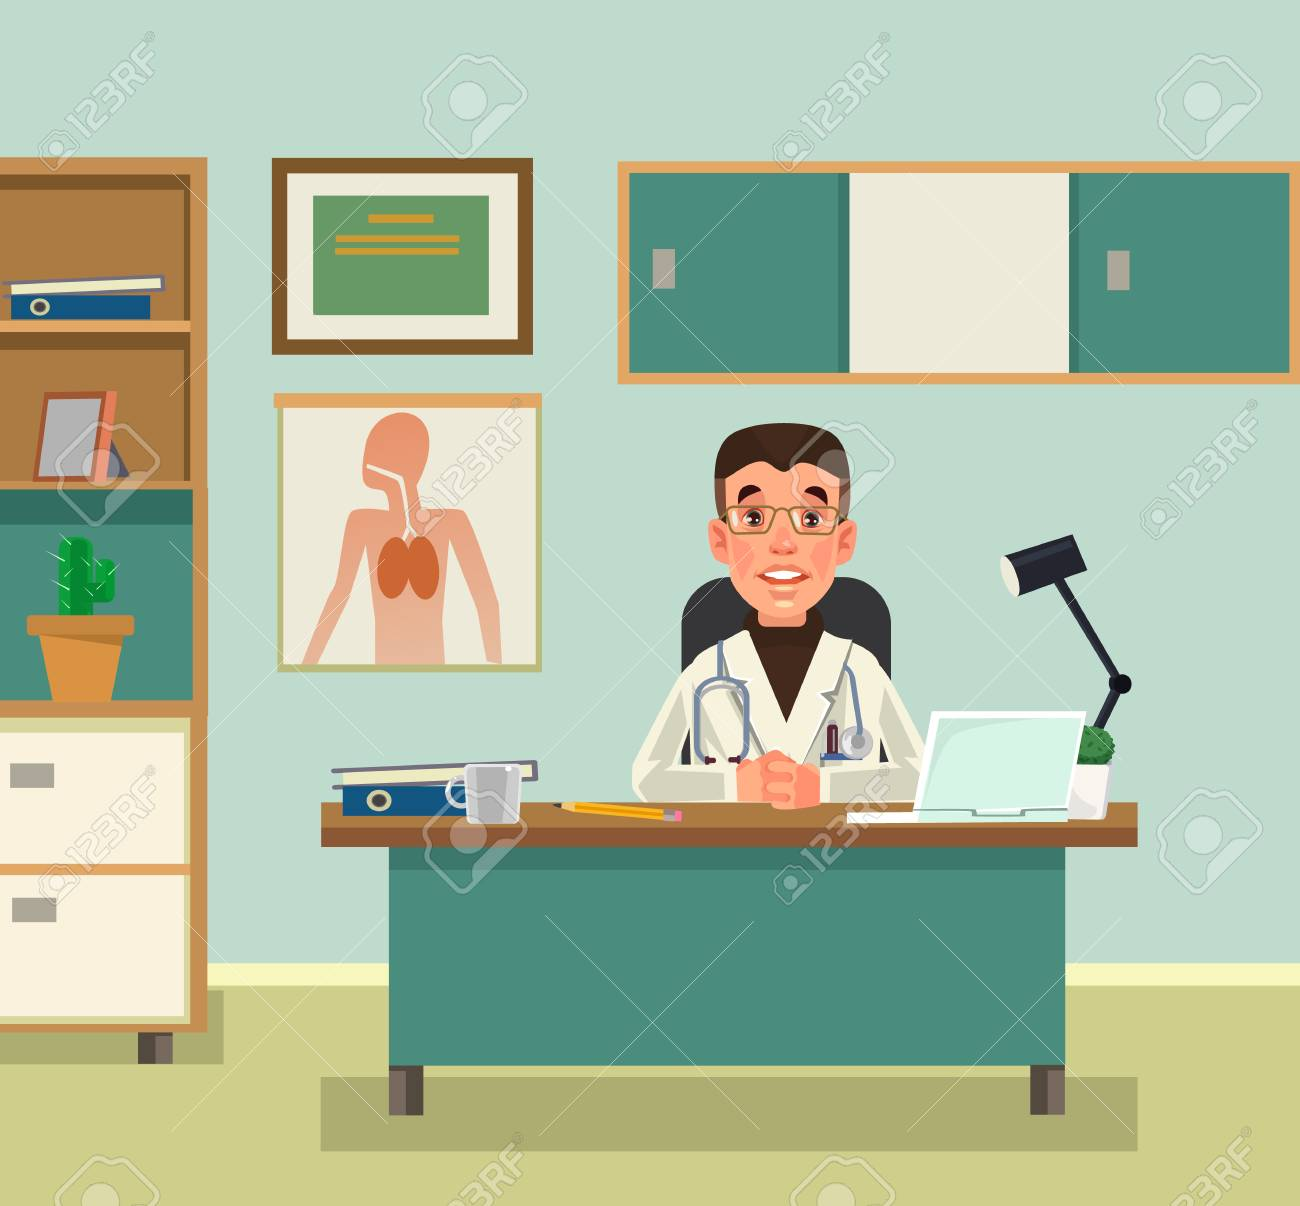 Doctor character waiting at reception. Vector flat cartoon illustration - 95732724